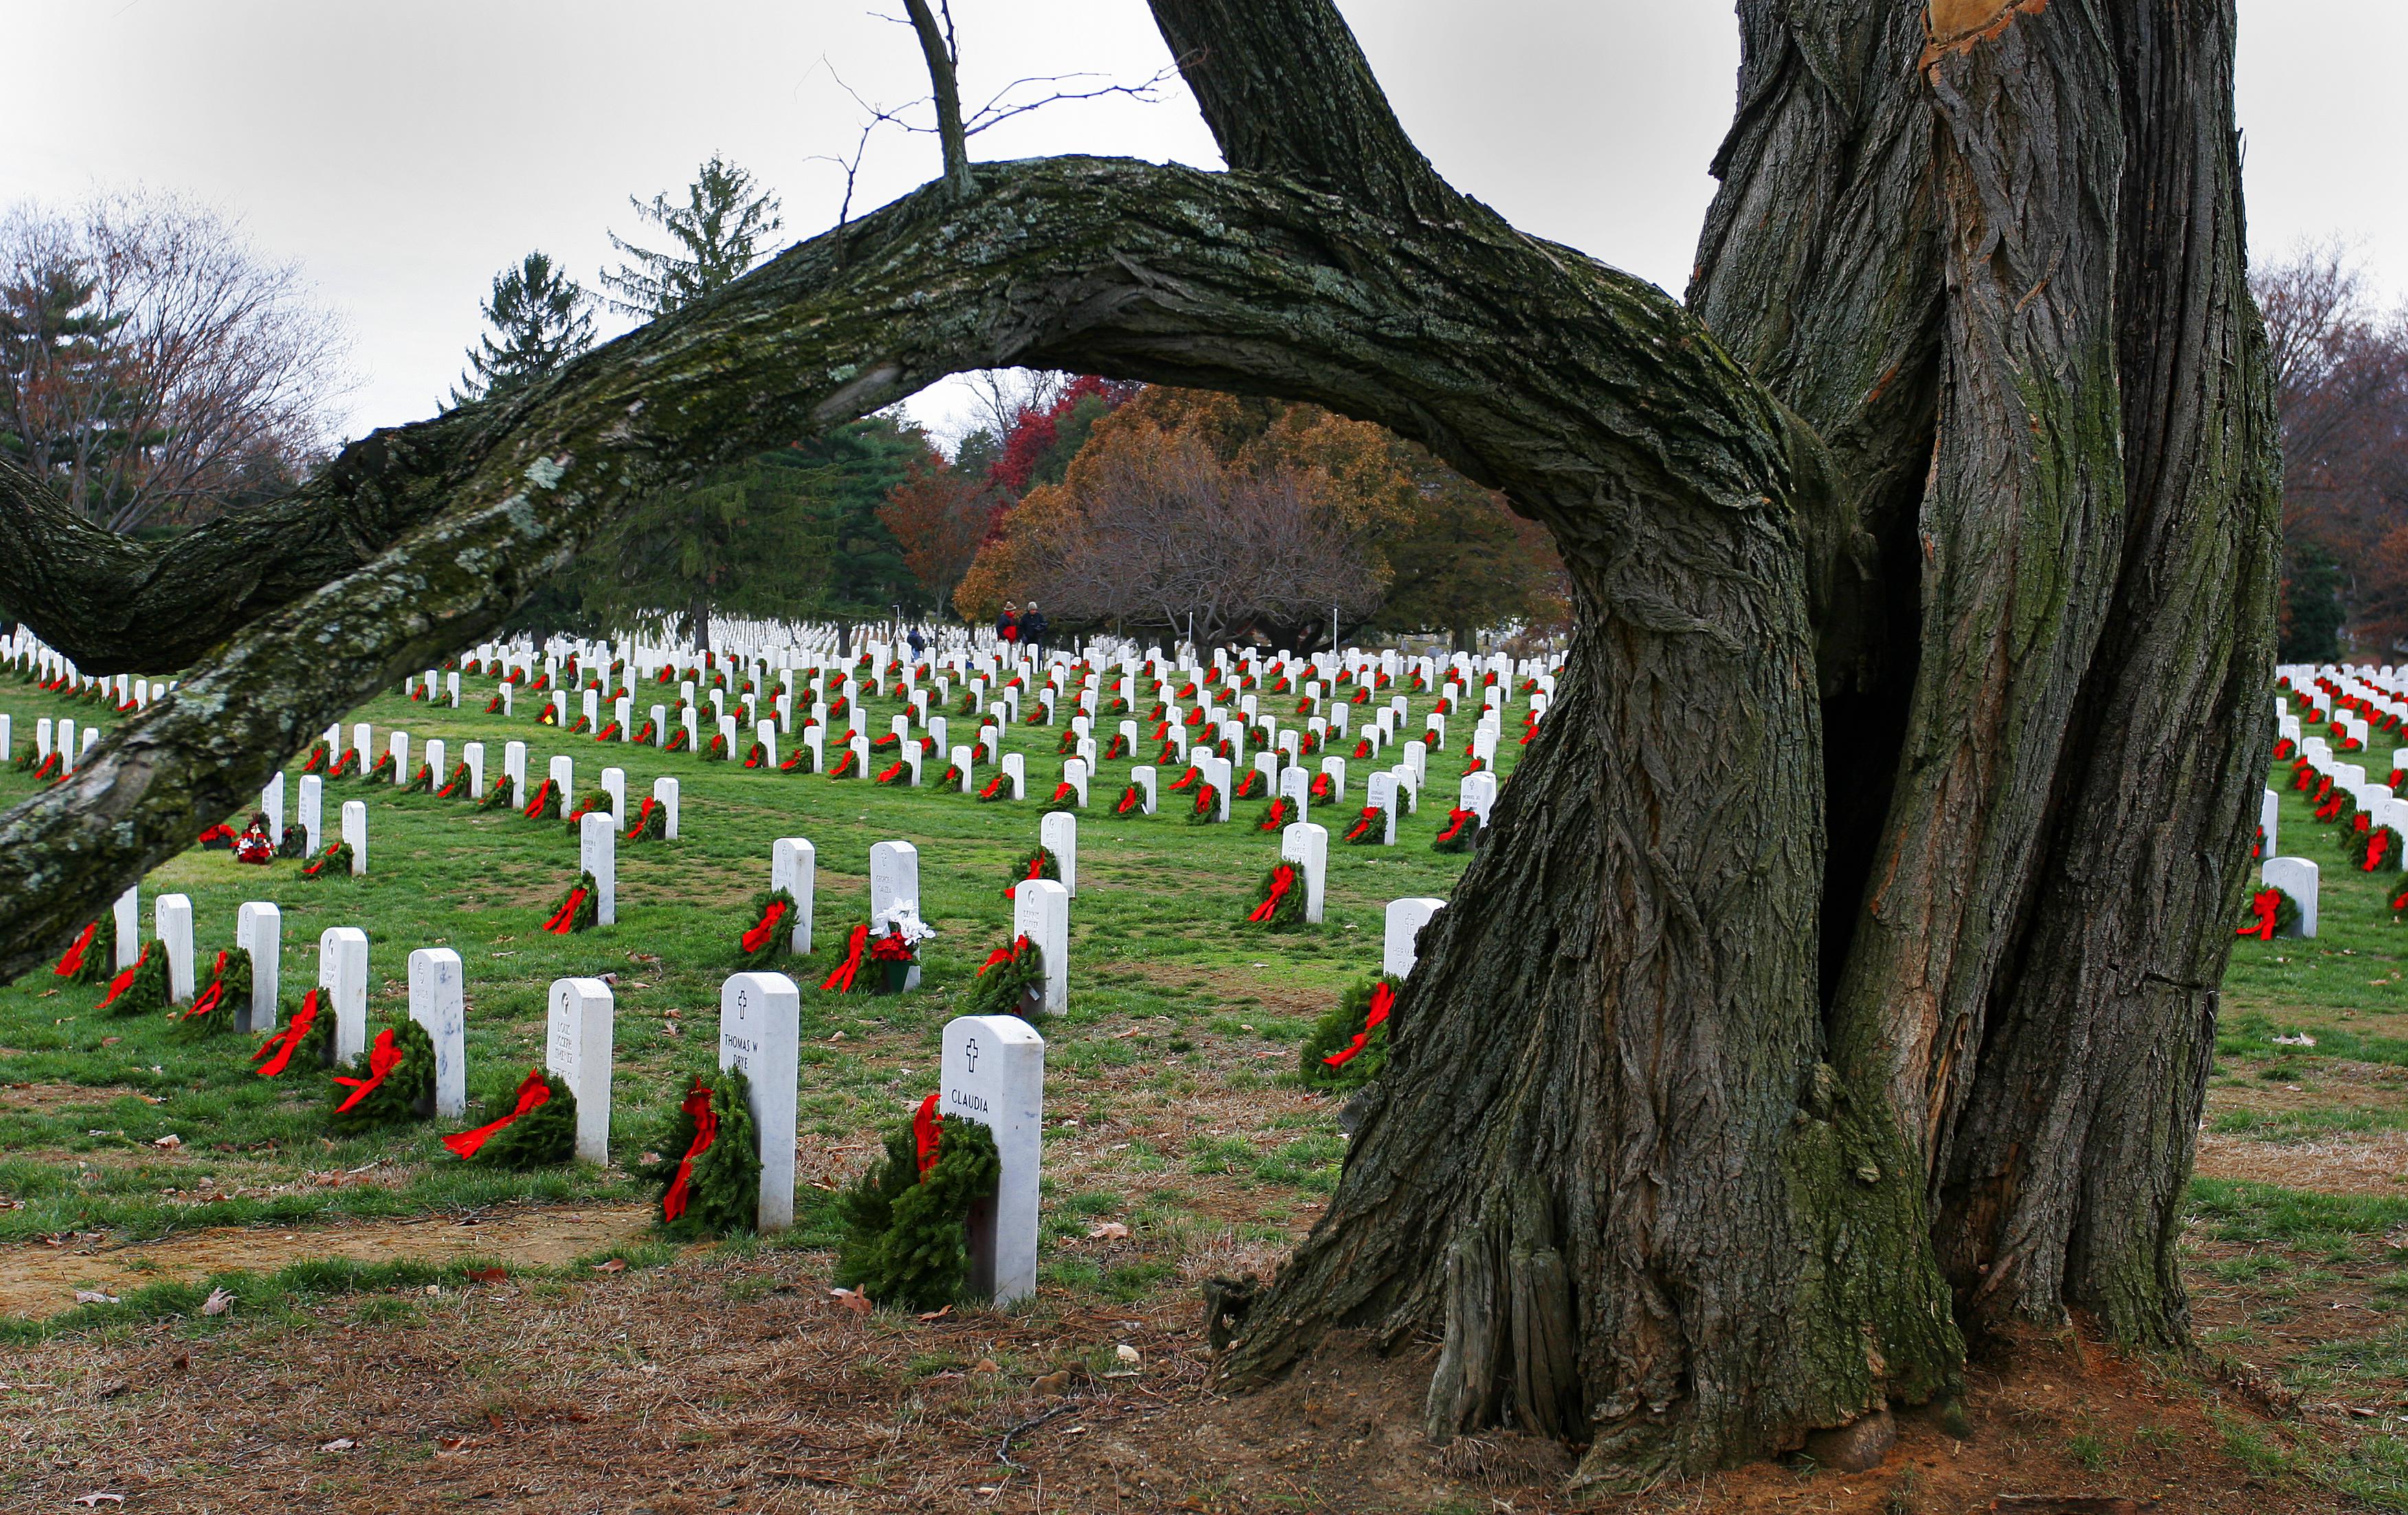 Cemetery clipart gravesite. Free public domain image